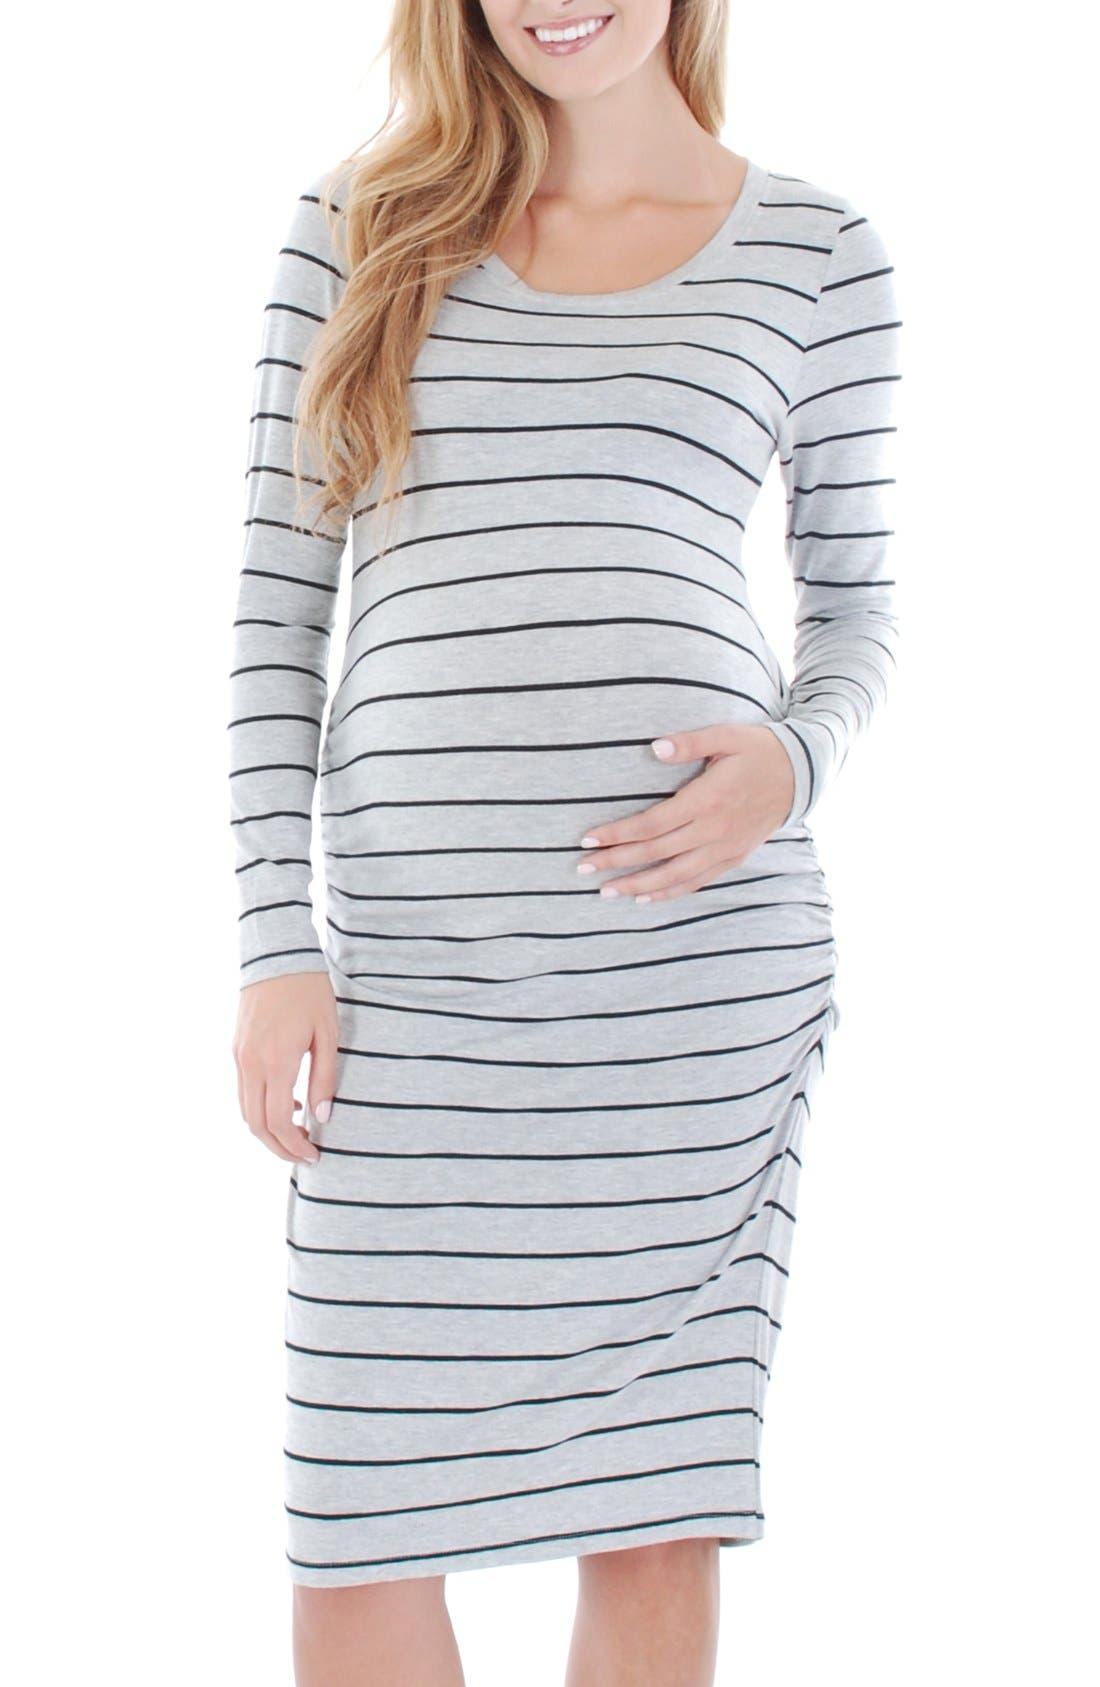 EverlyGrey 'Hanh' Maternity T-Shirt Dress,                         Main,                         color, GREY STRIPE